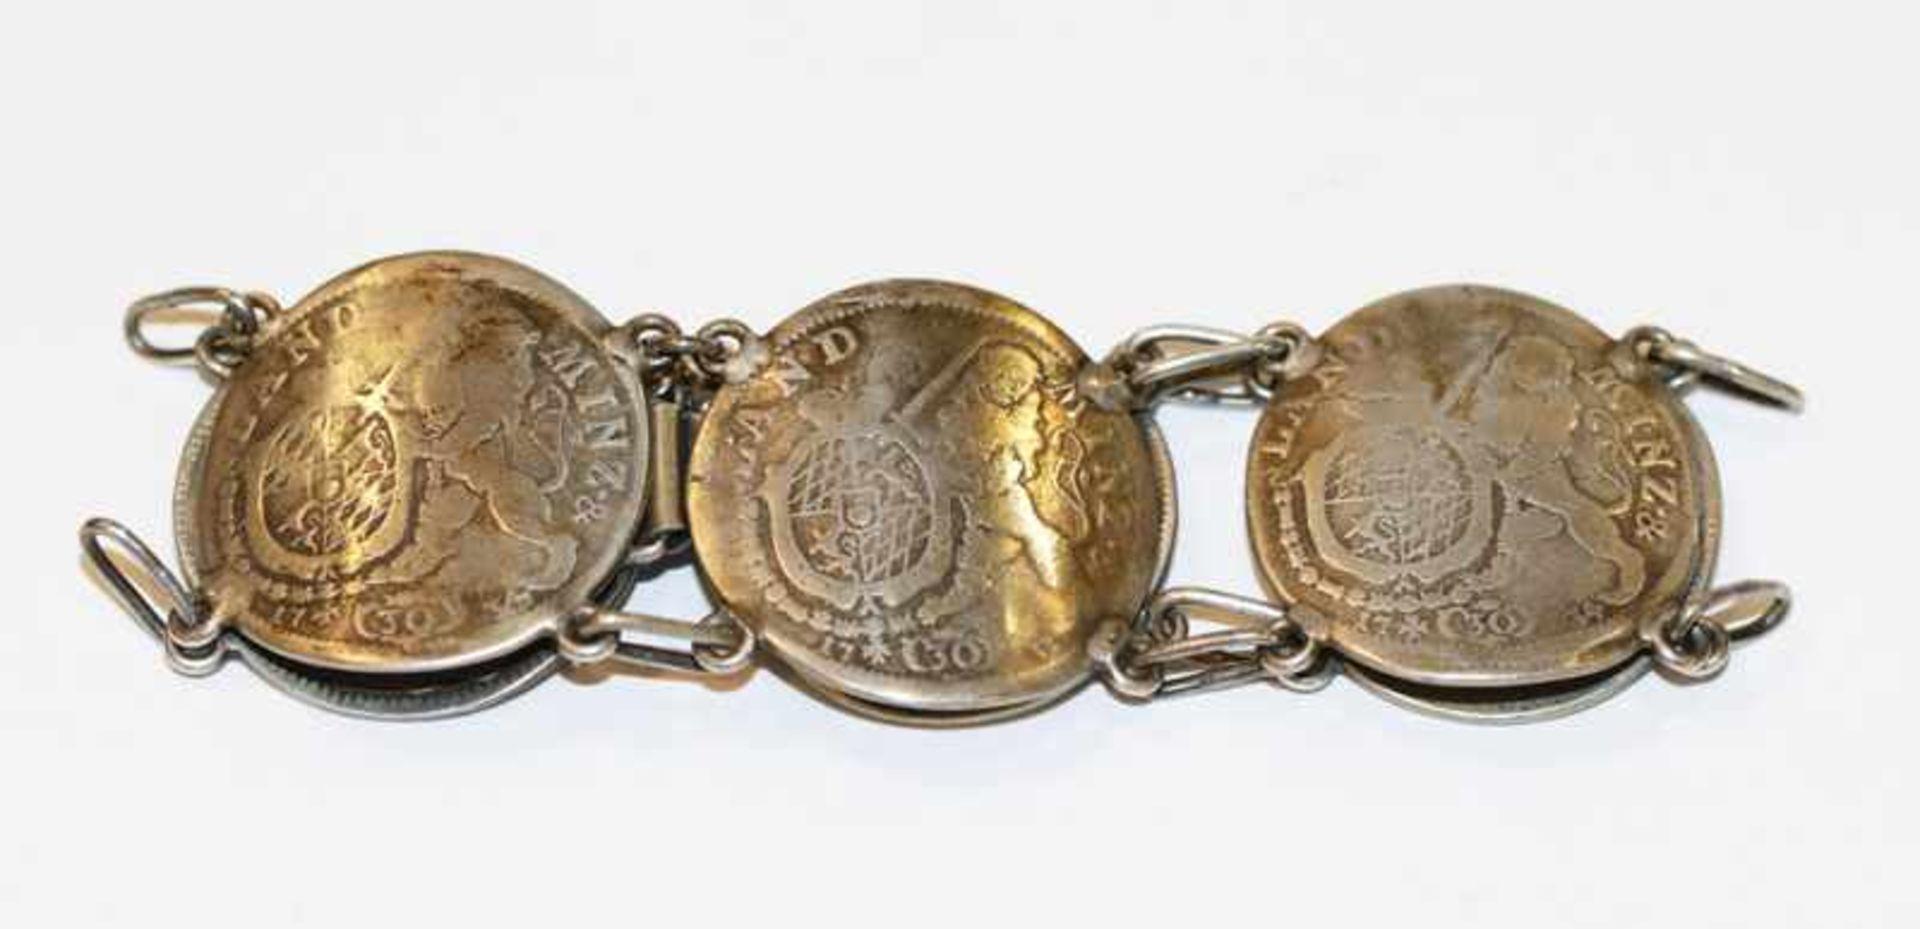 Los 3 - Silber Armband aus 6 x 30 Kreuzer um 1733, 43 gr., L 18 cm, getragen